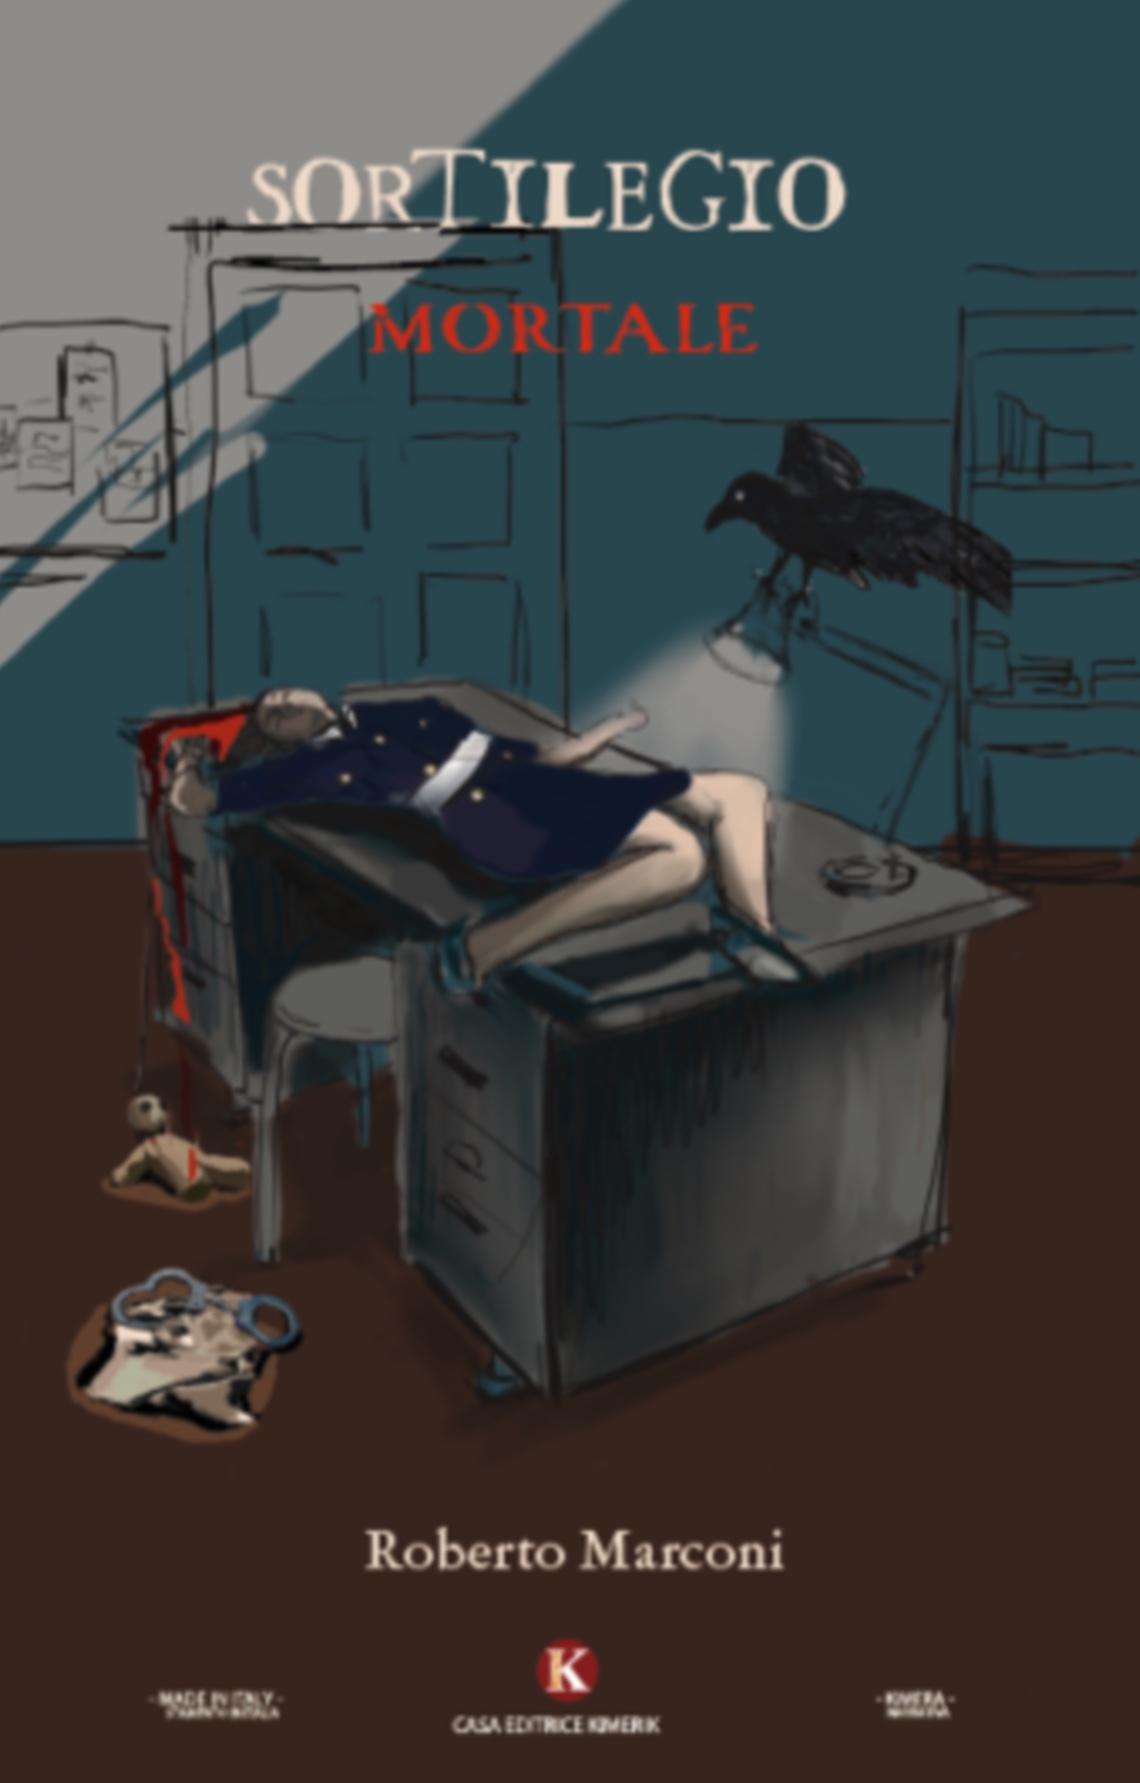 Sortilegio mortale